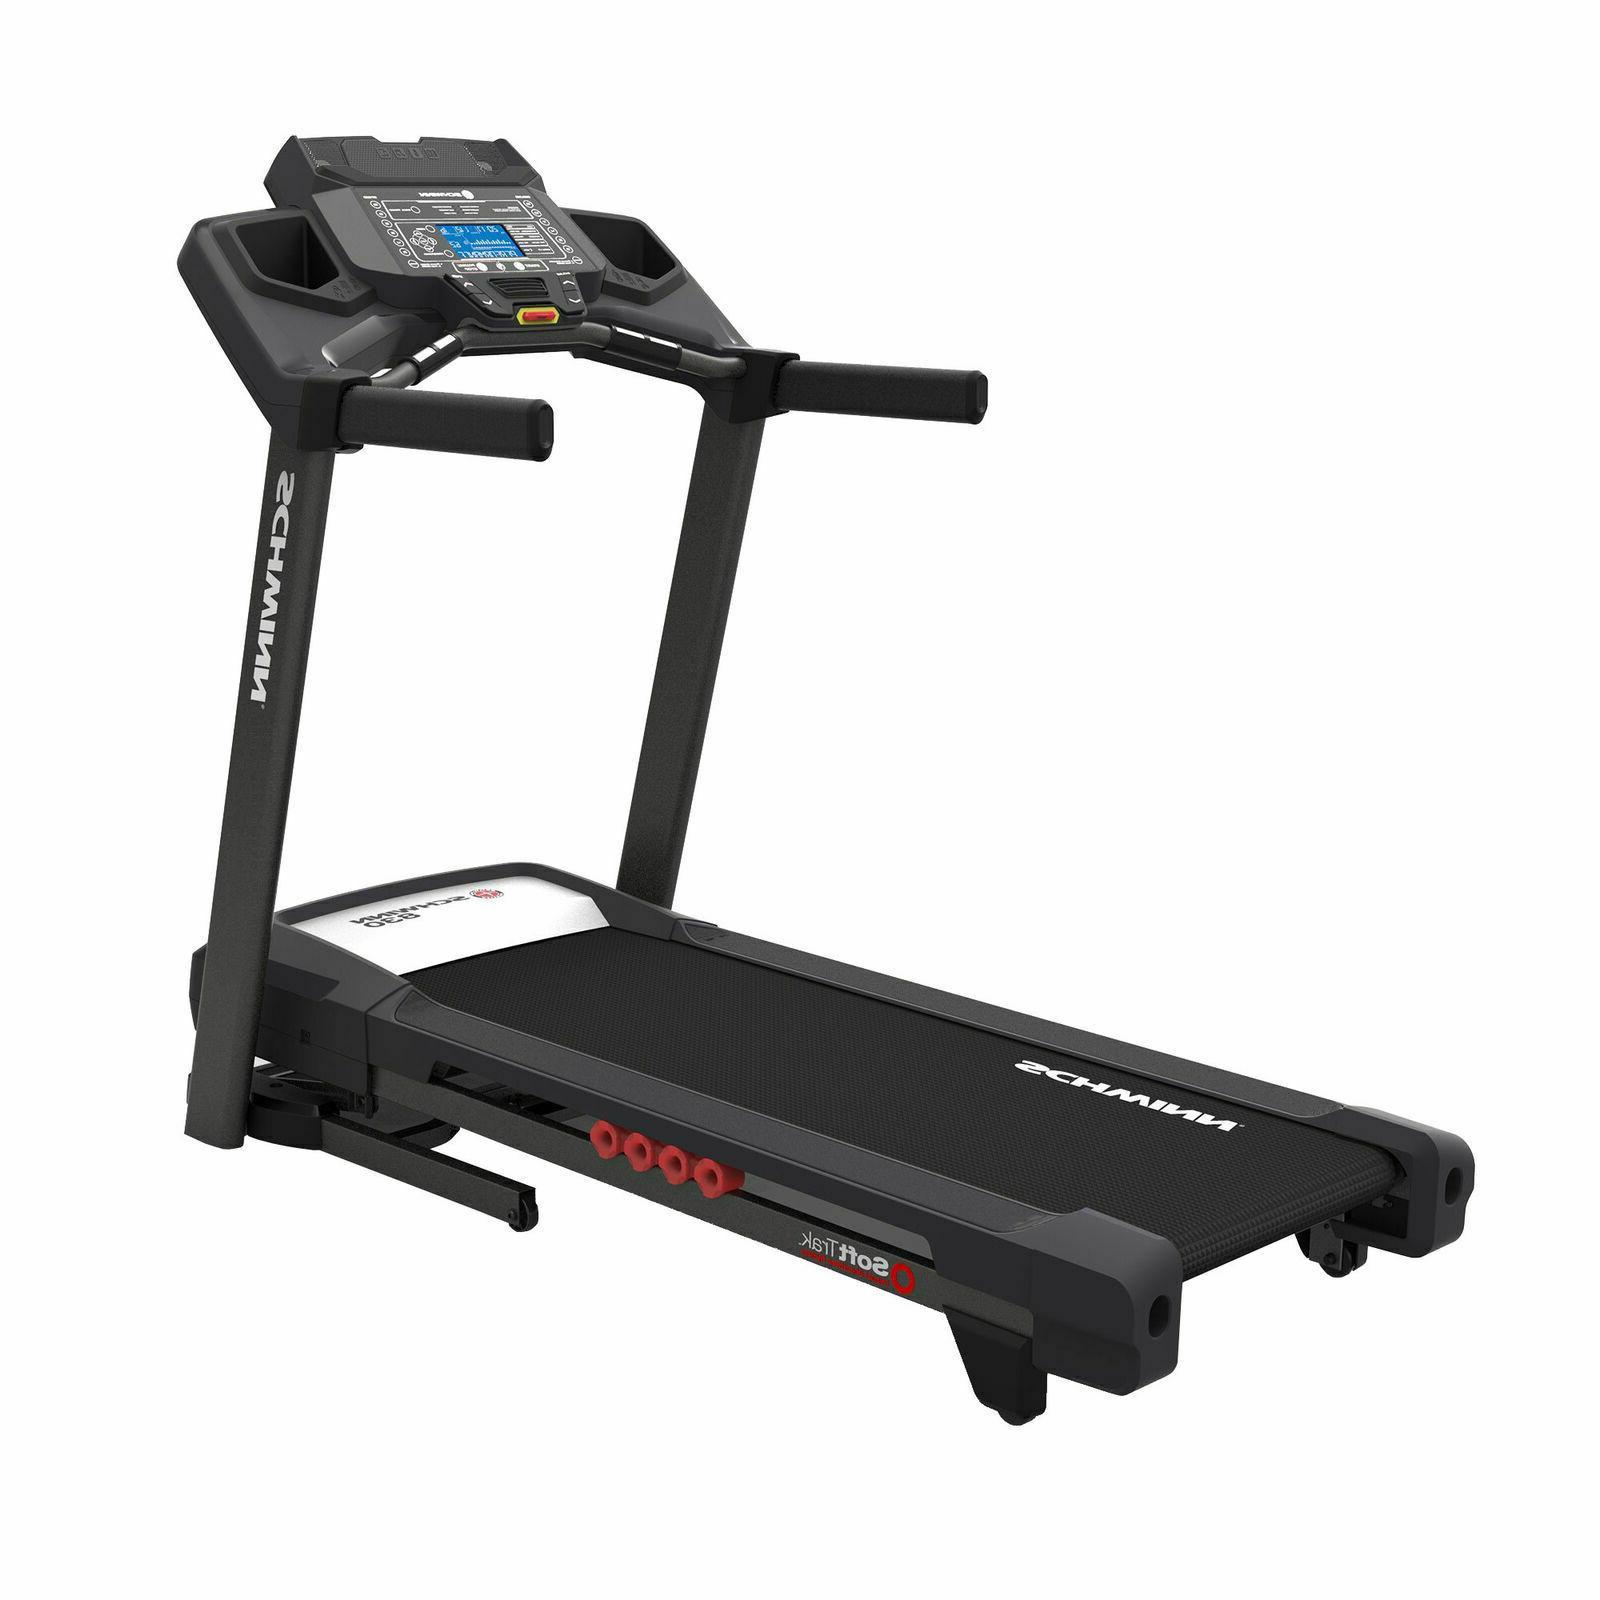 new 830 treadmill